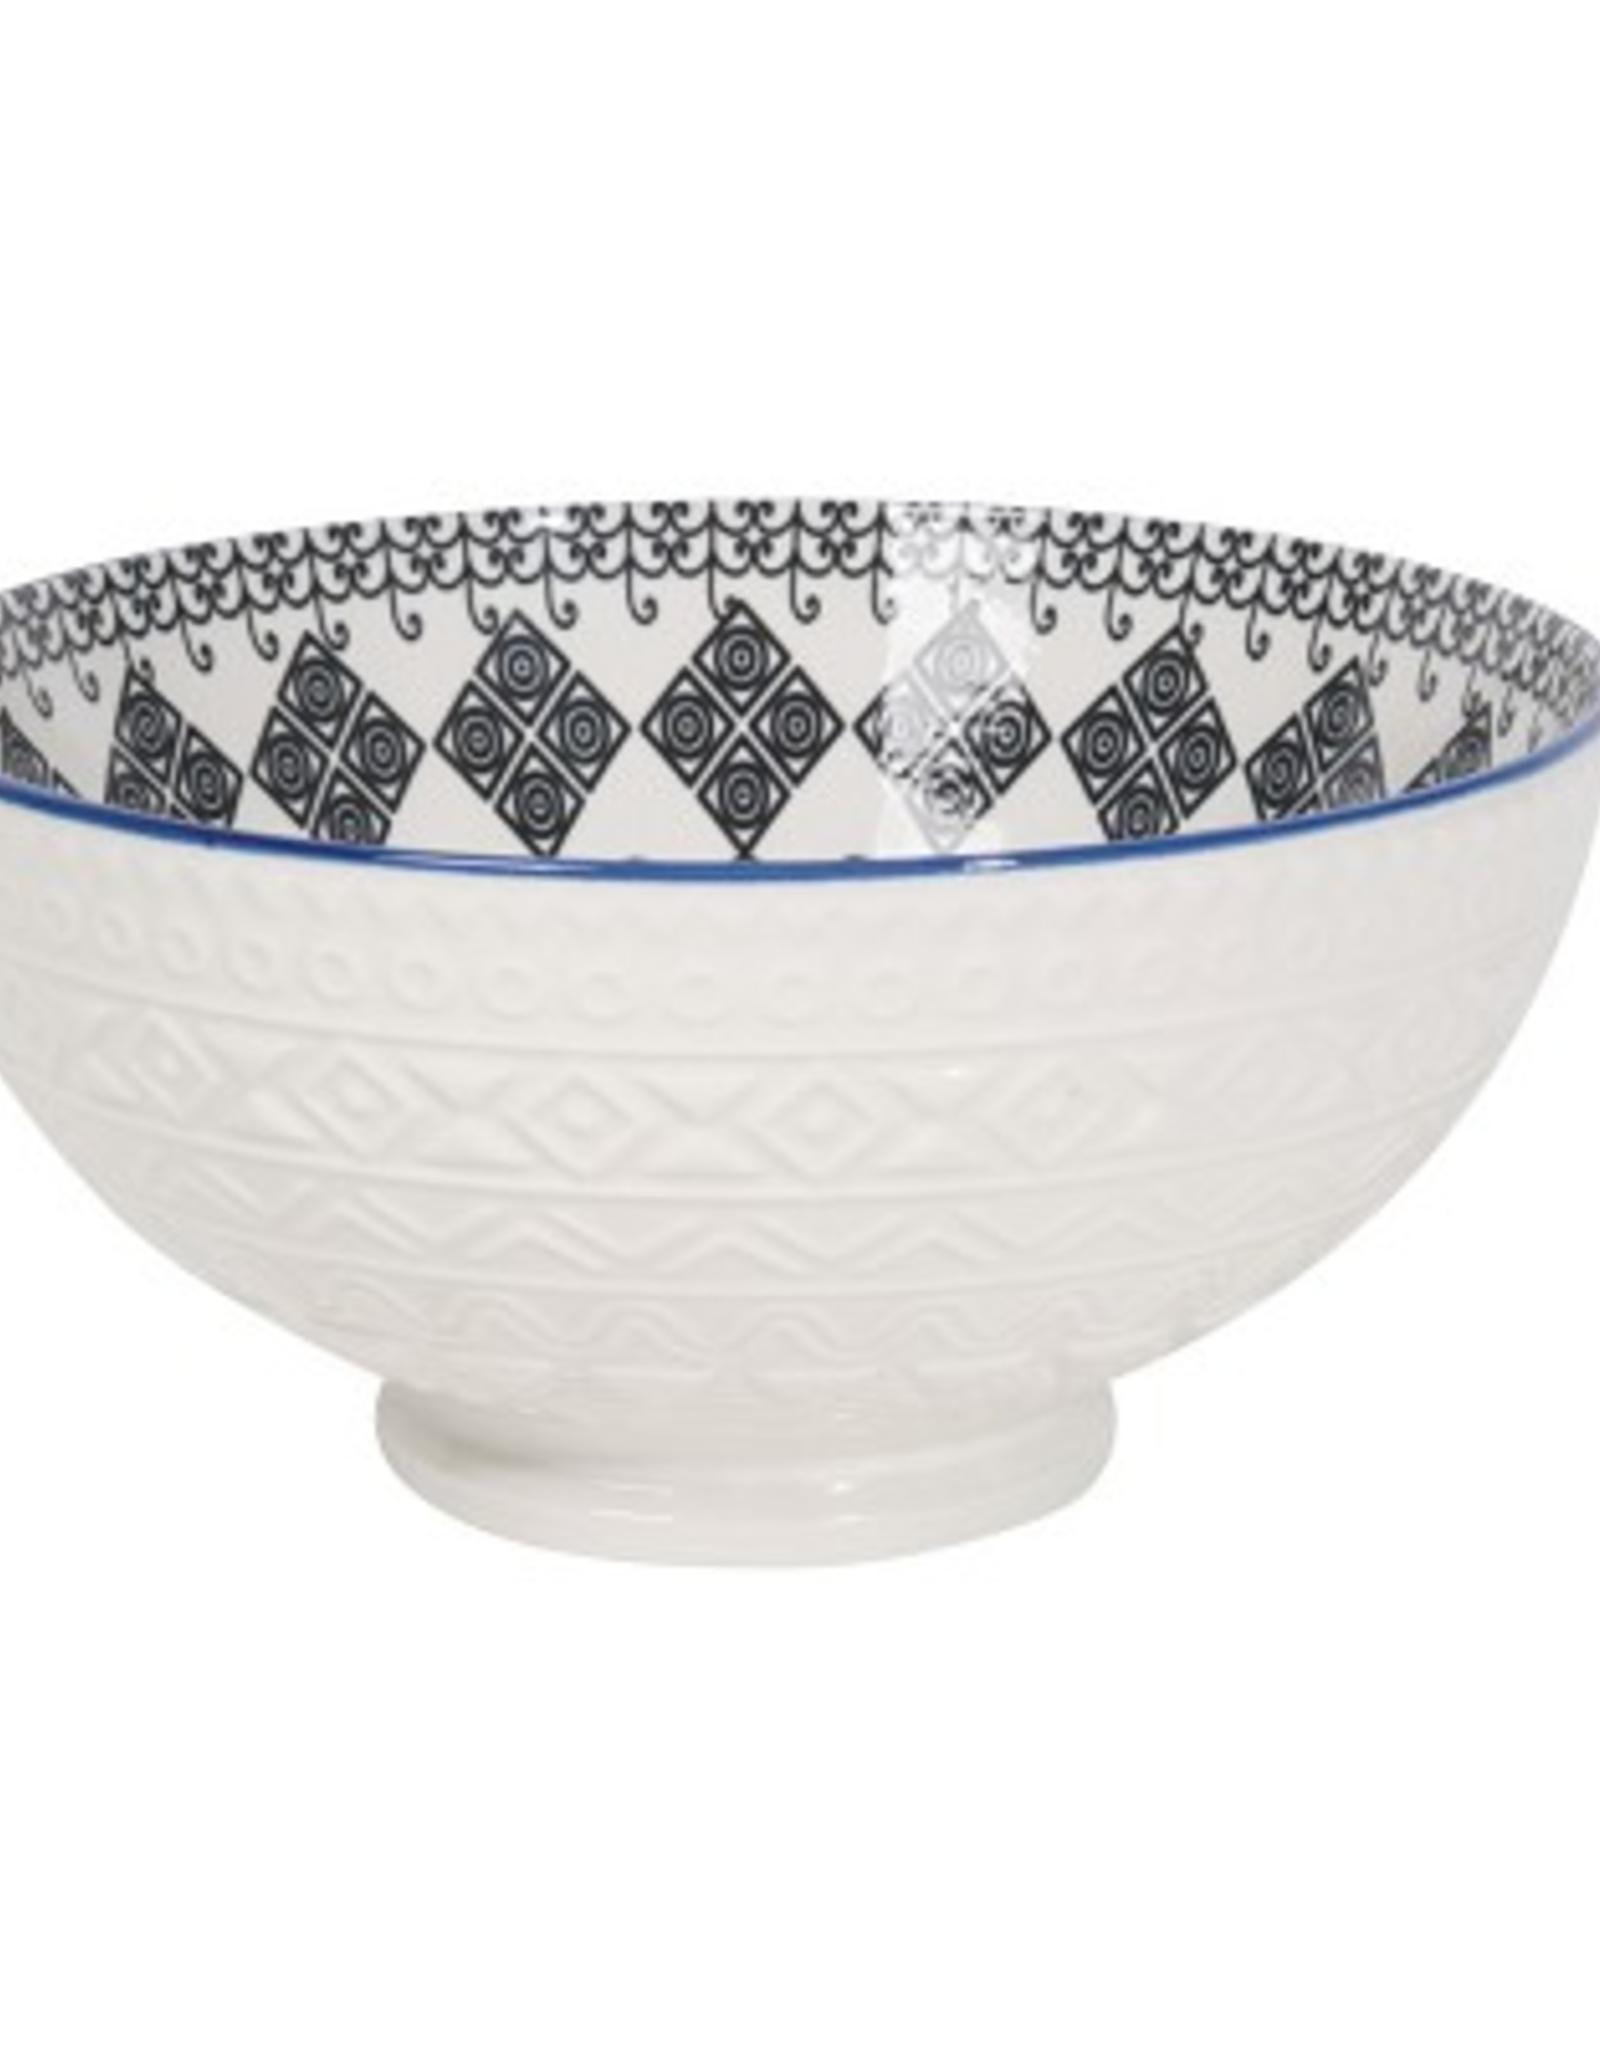 Now Designs Embossed Bowl, Casablanca 55oz